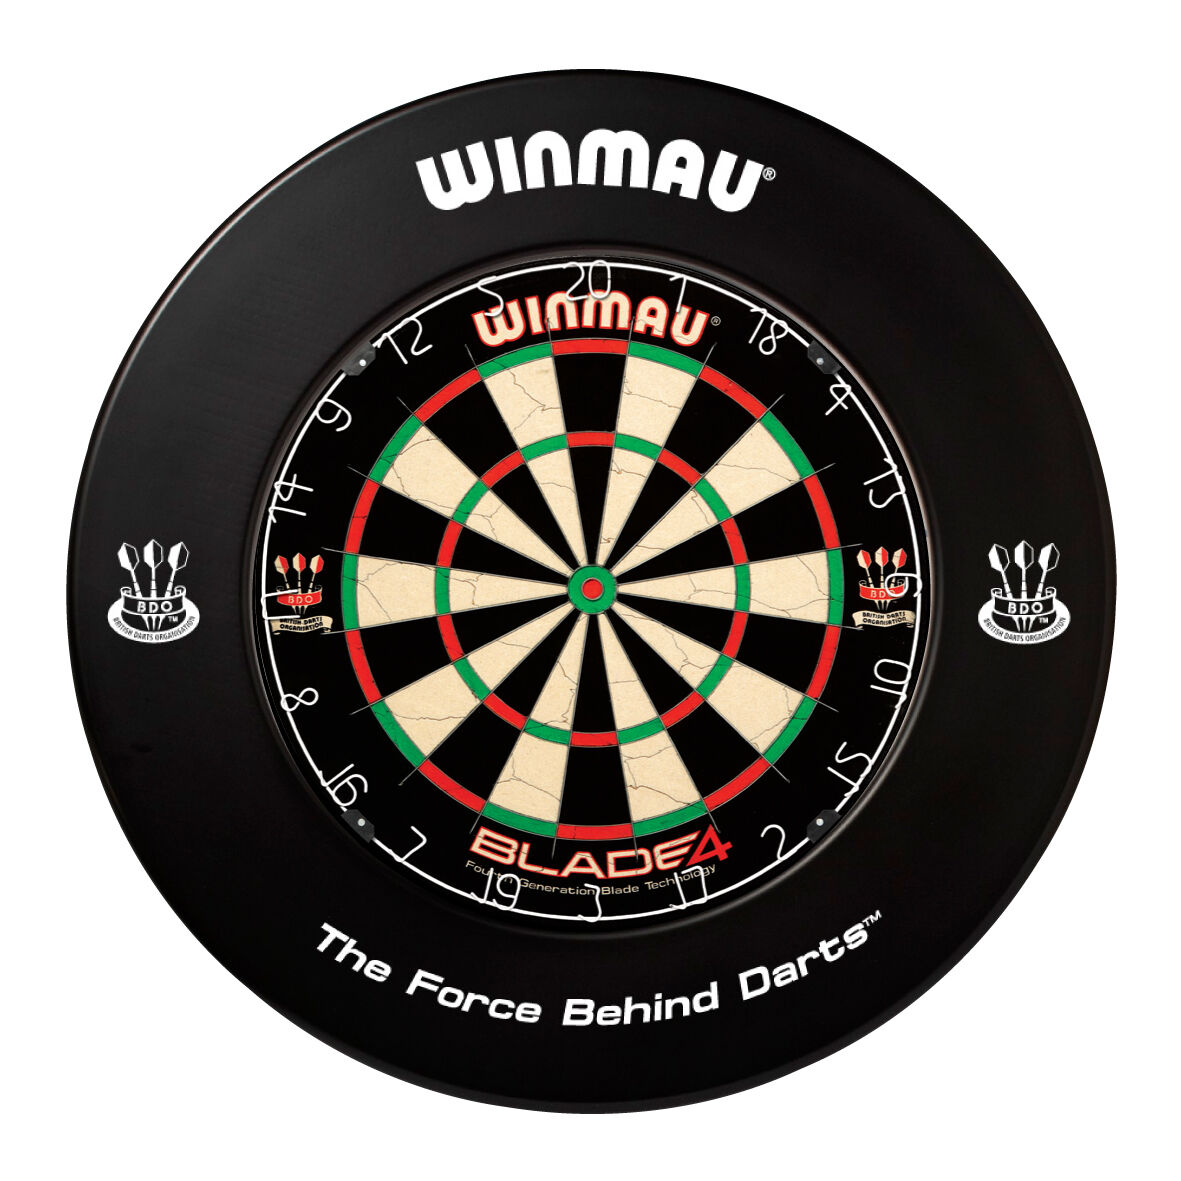 Winmau Dartboard Surround Heavy Duty BDO Dart Board Rubber Ring Assorted Colours